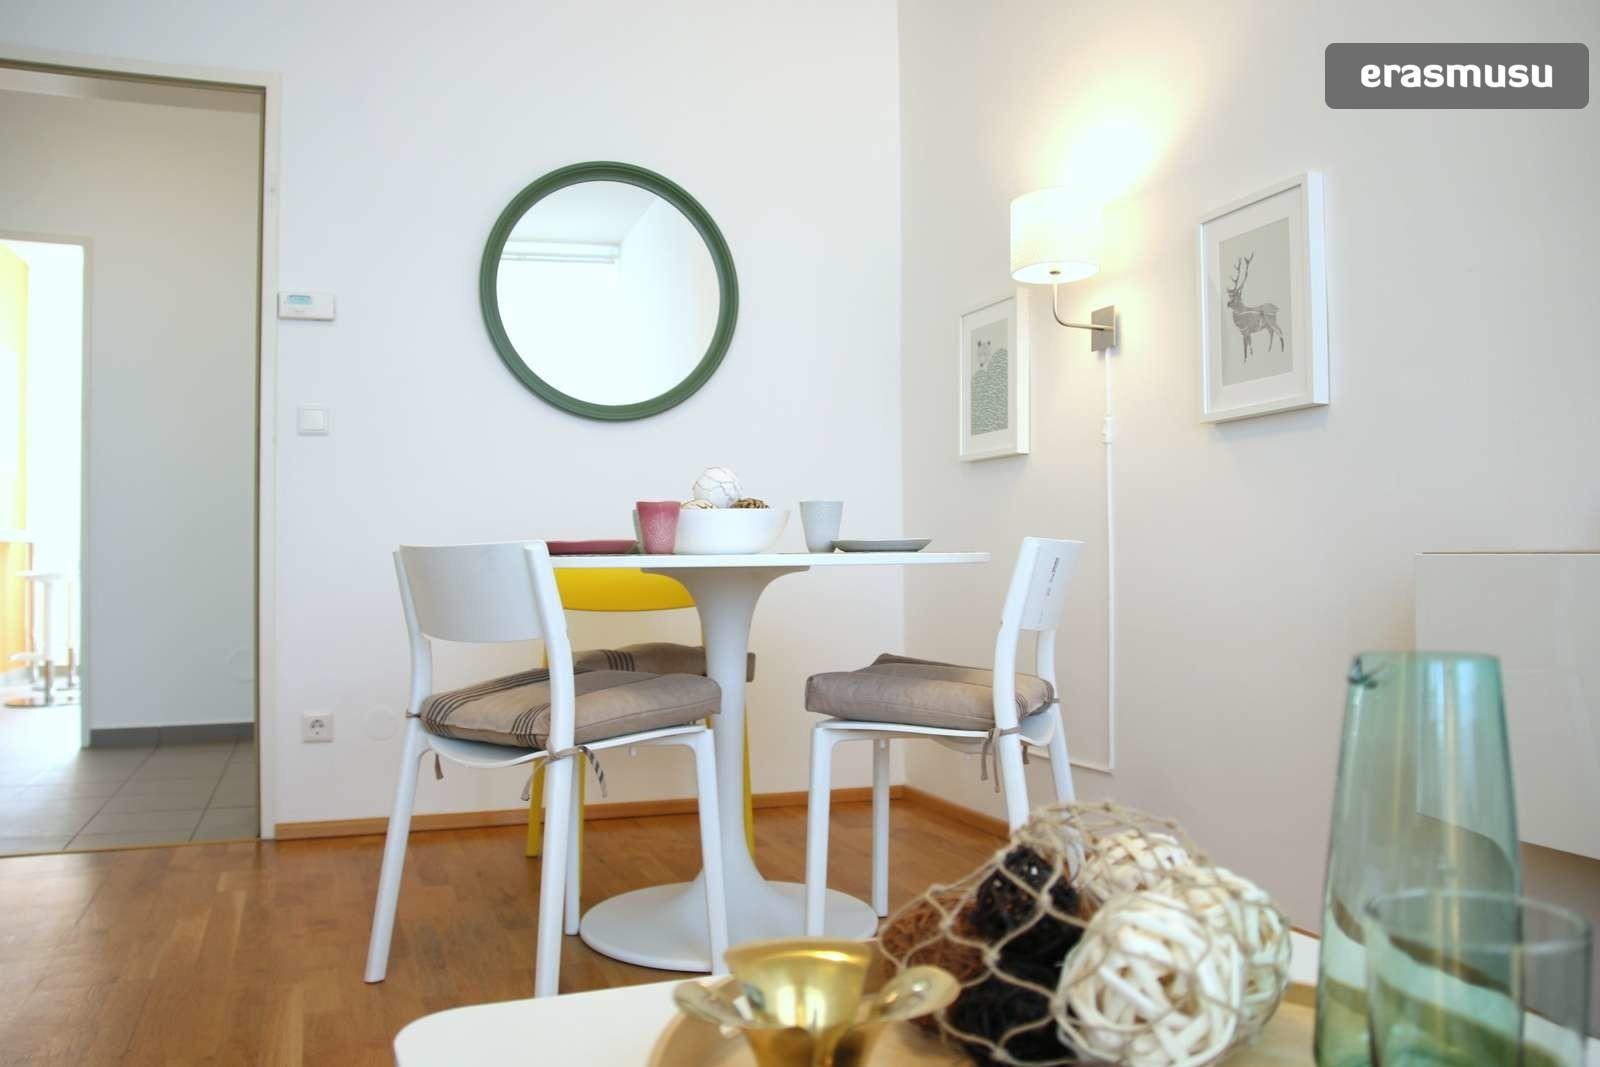 lovely-studio-apartment-rent-wahring-994fc77b80c2c066dfb7660b0e8